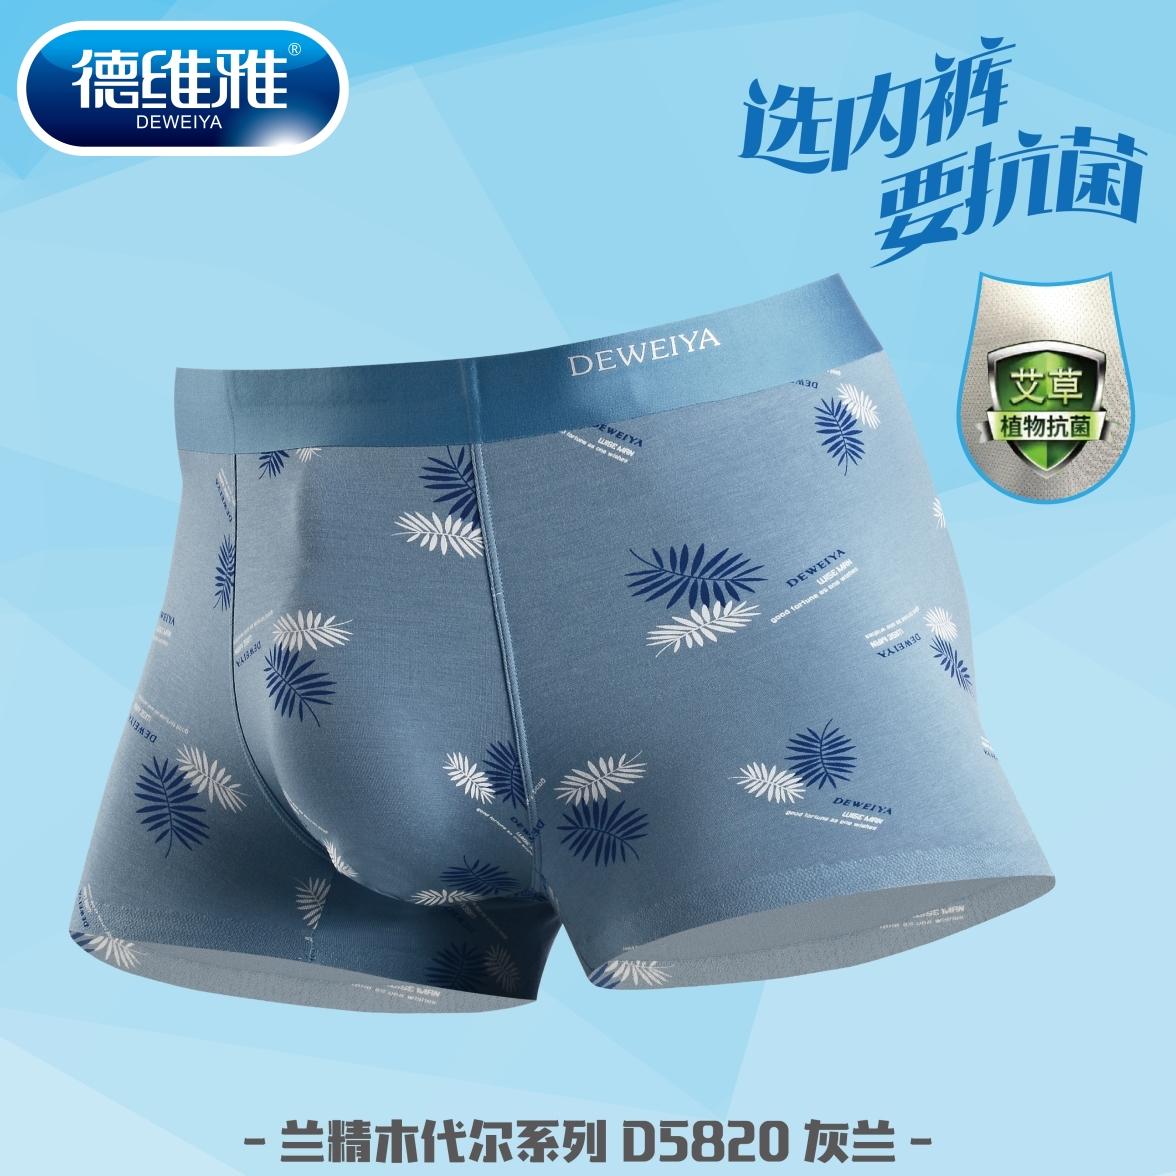 Devialand jingmodale printed mens antibacterial underwear bamboo fiber Ivey boxers Boxers